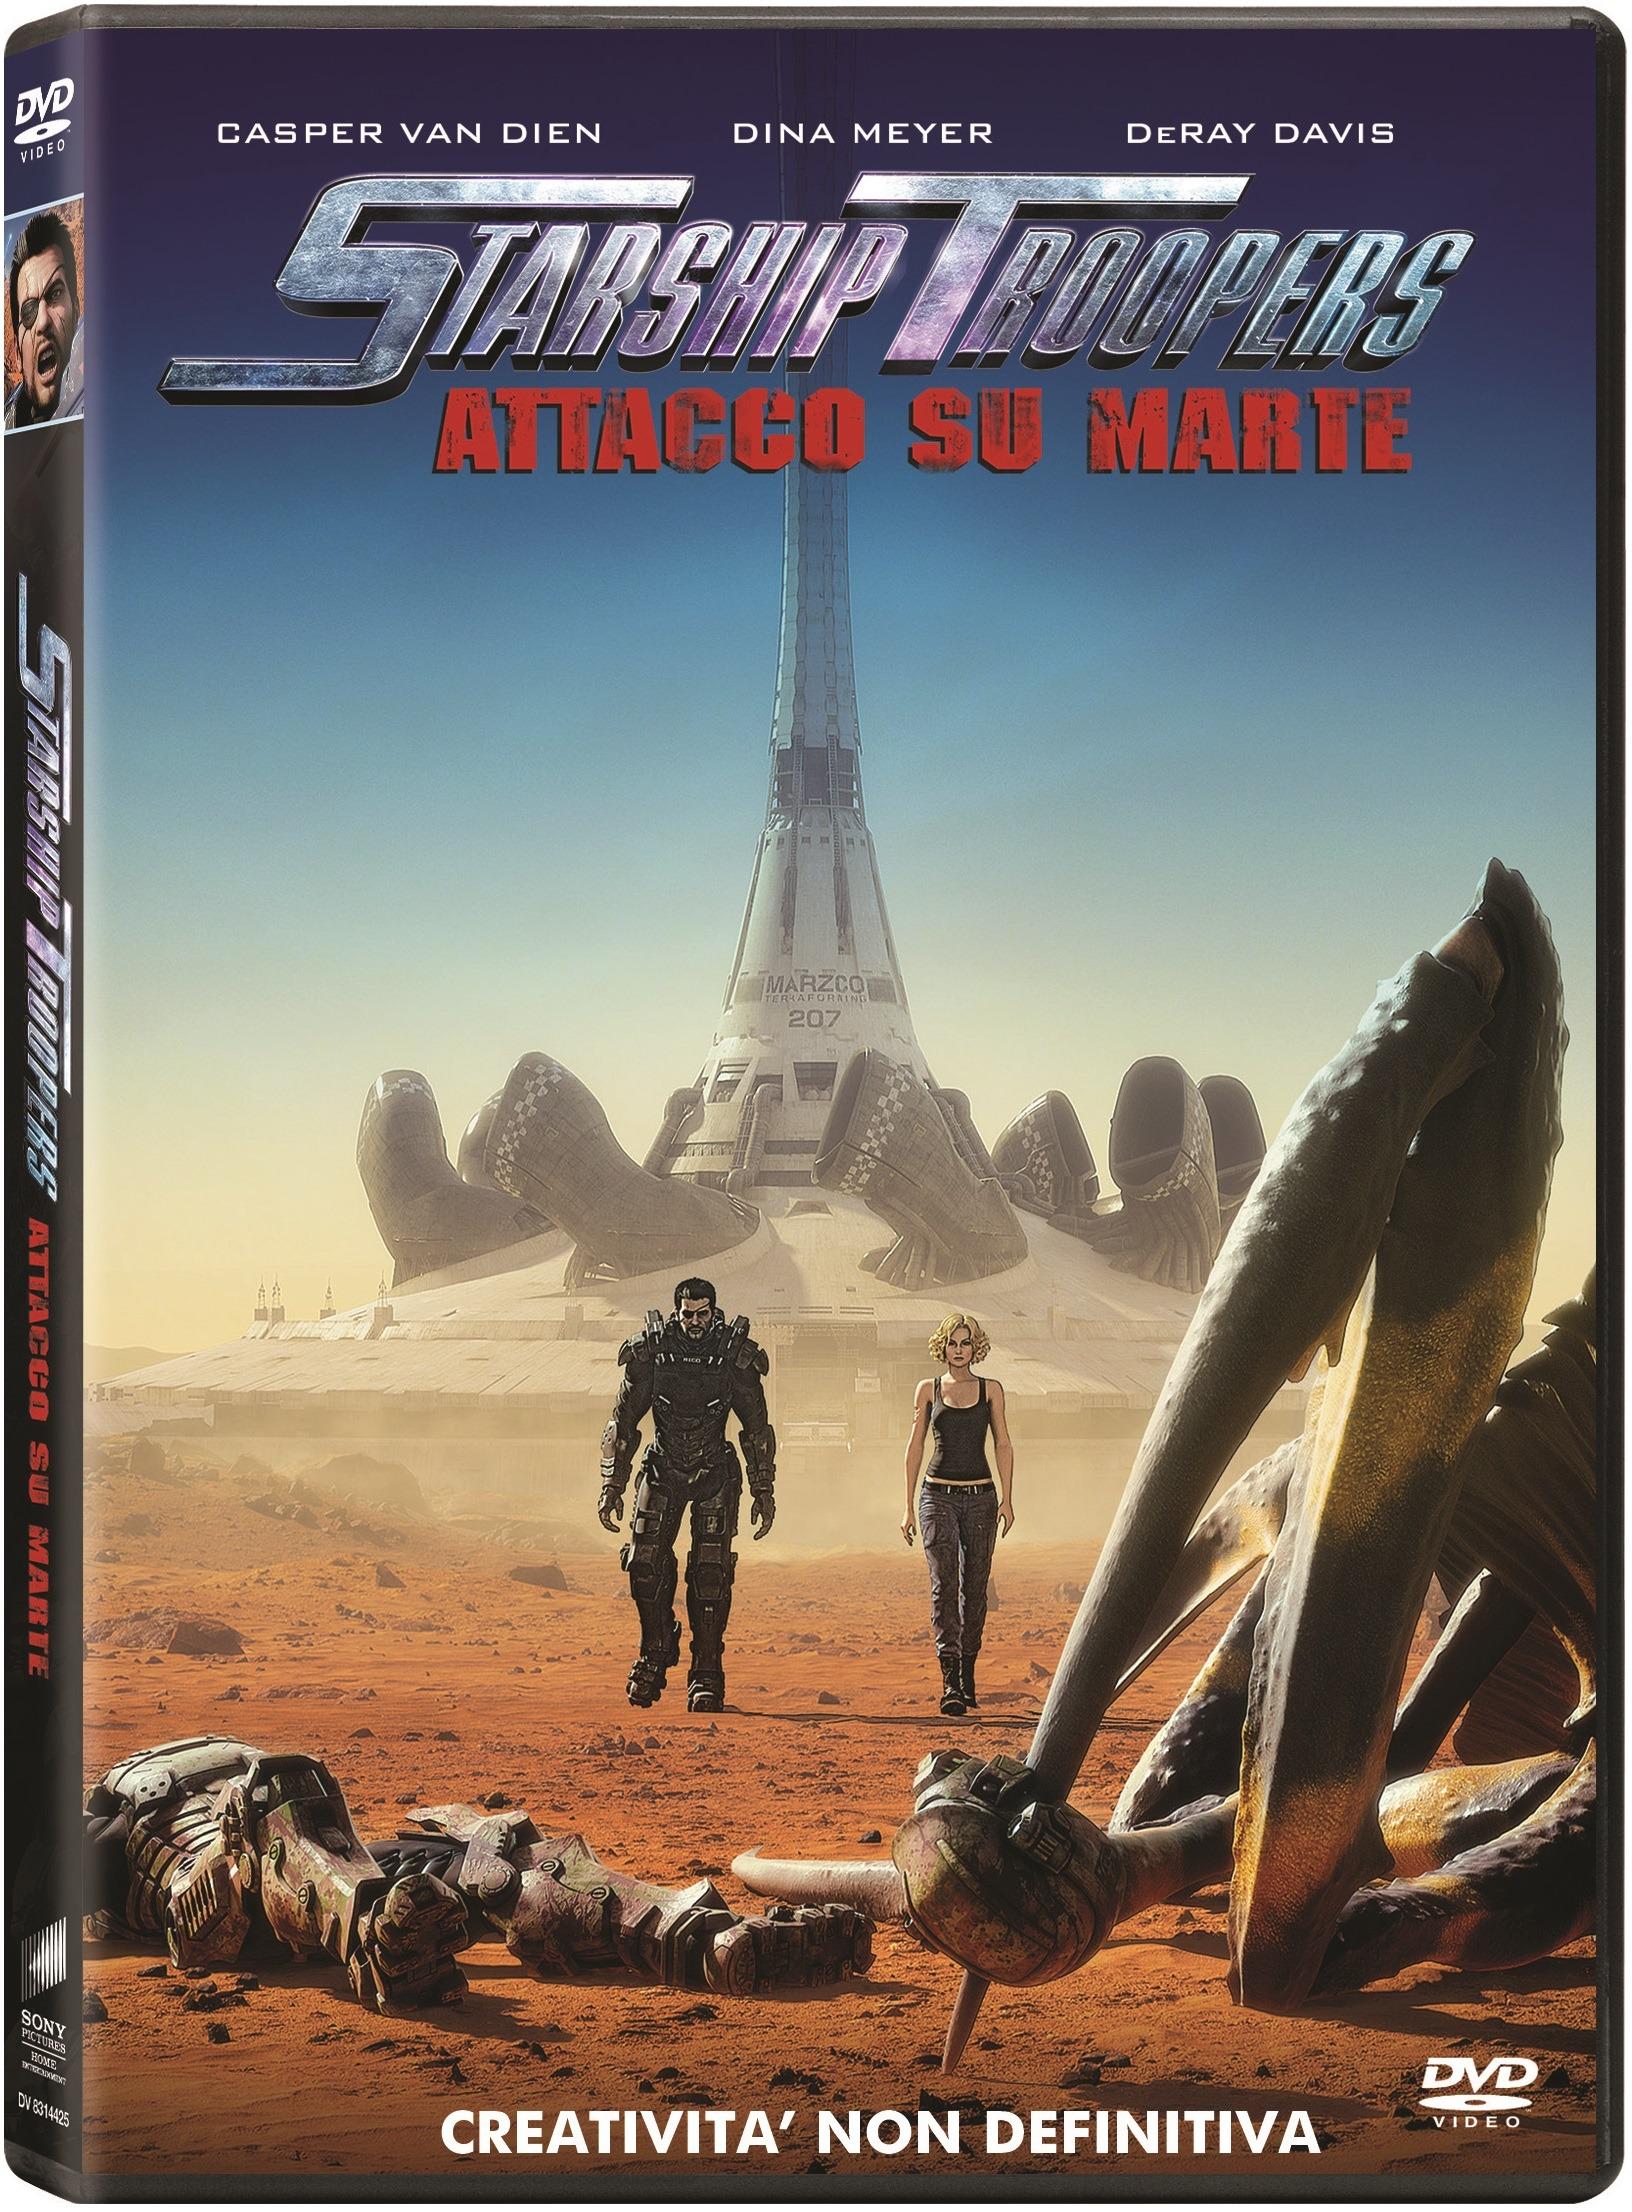 STARSHIP TROOPERS - ATTACCO SU MARTE (DVD)